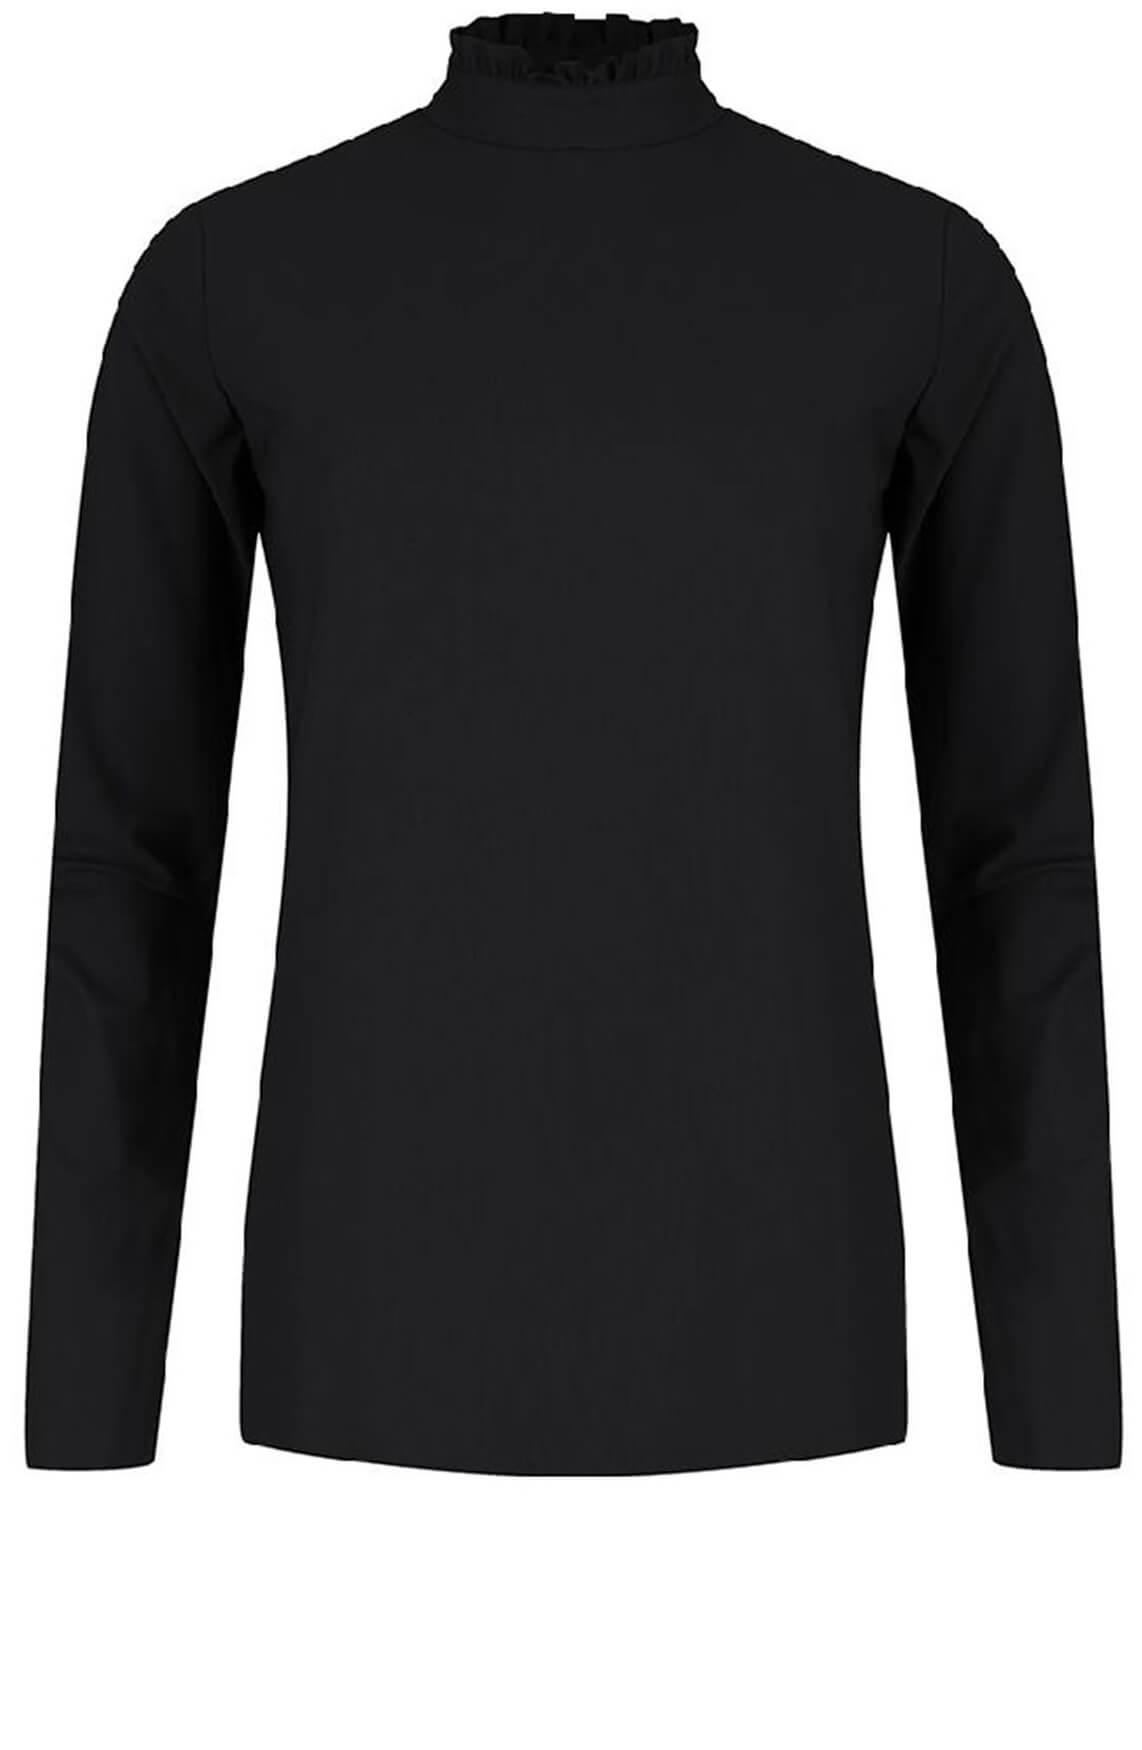 Jane Lushka Dames Shirt met ruche kraag zwart